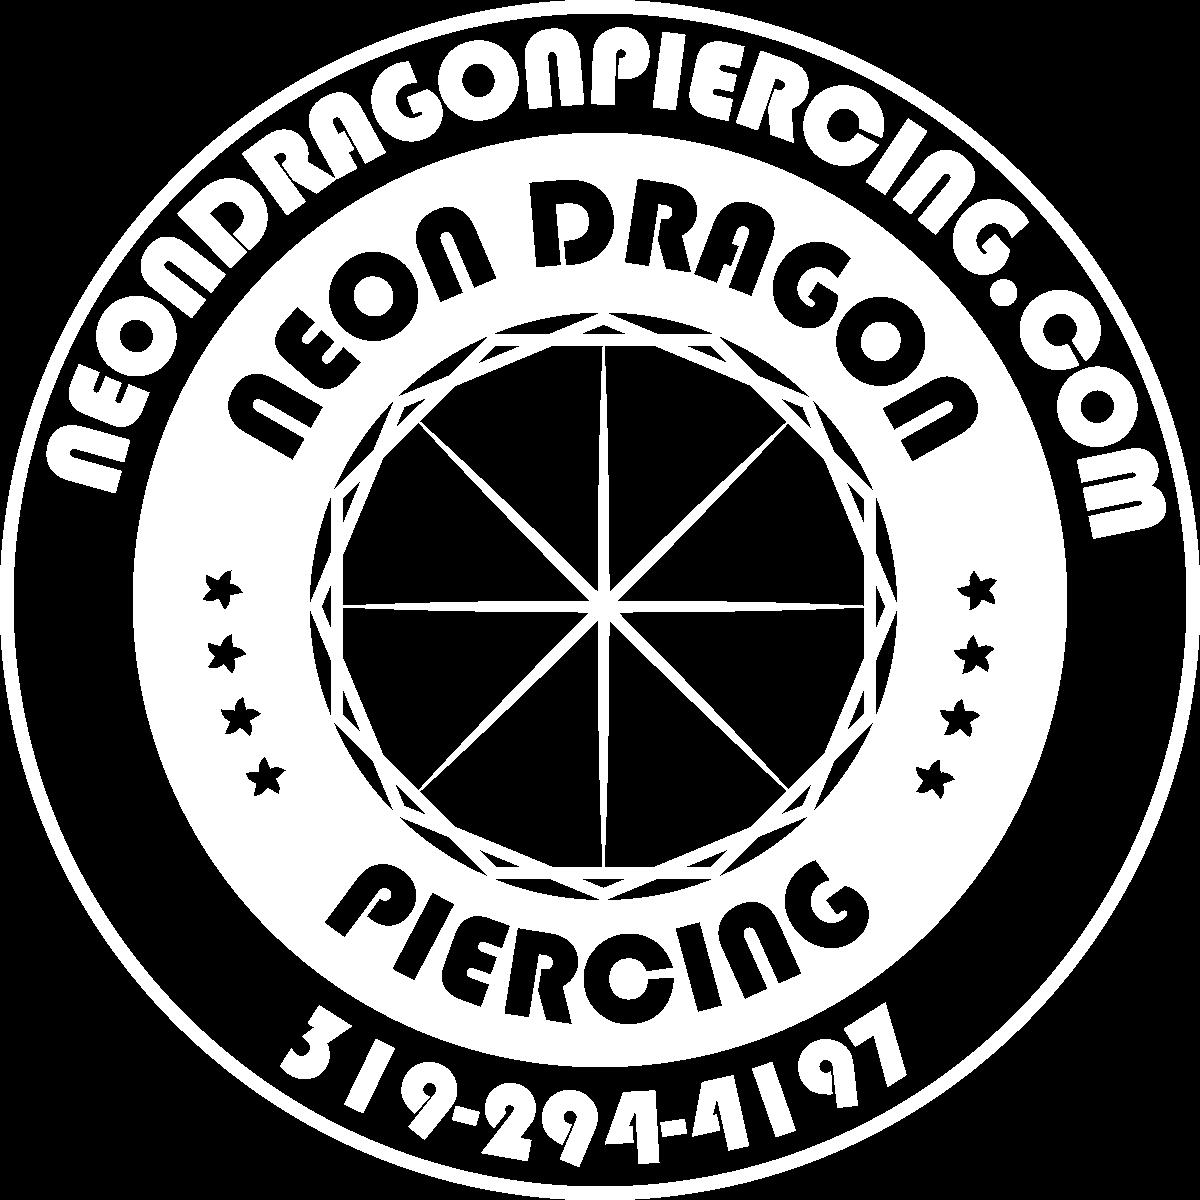 Logo for Neon Dragon Piercing